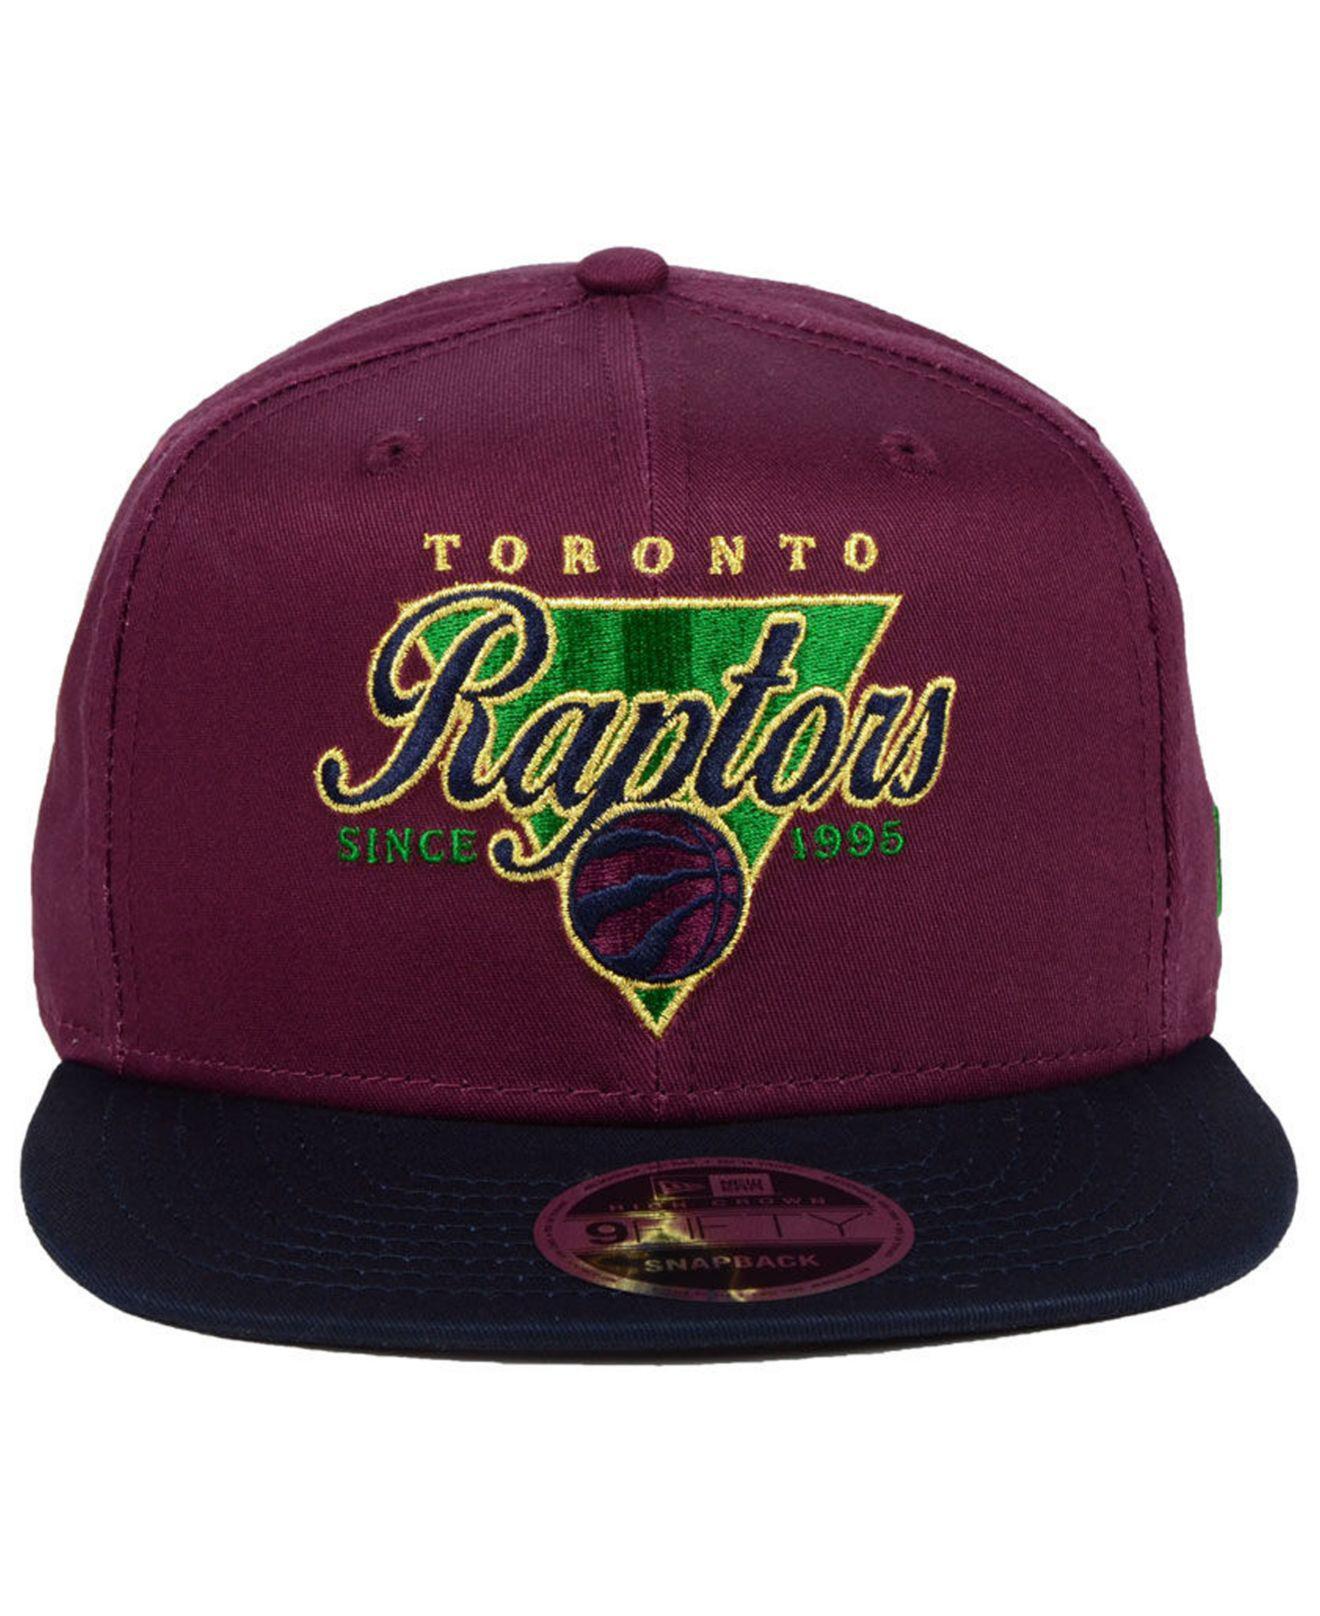 cf0f1e383dd KTZ Toronto Raptors 90s Throwback 9fifty Snapback Cap in Purple for ...